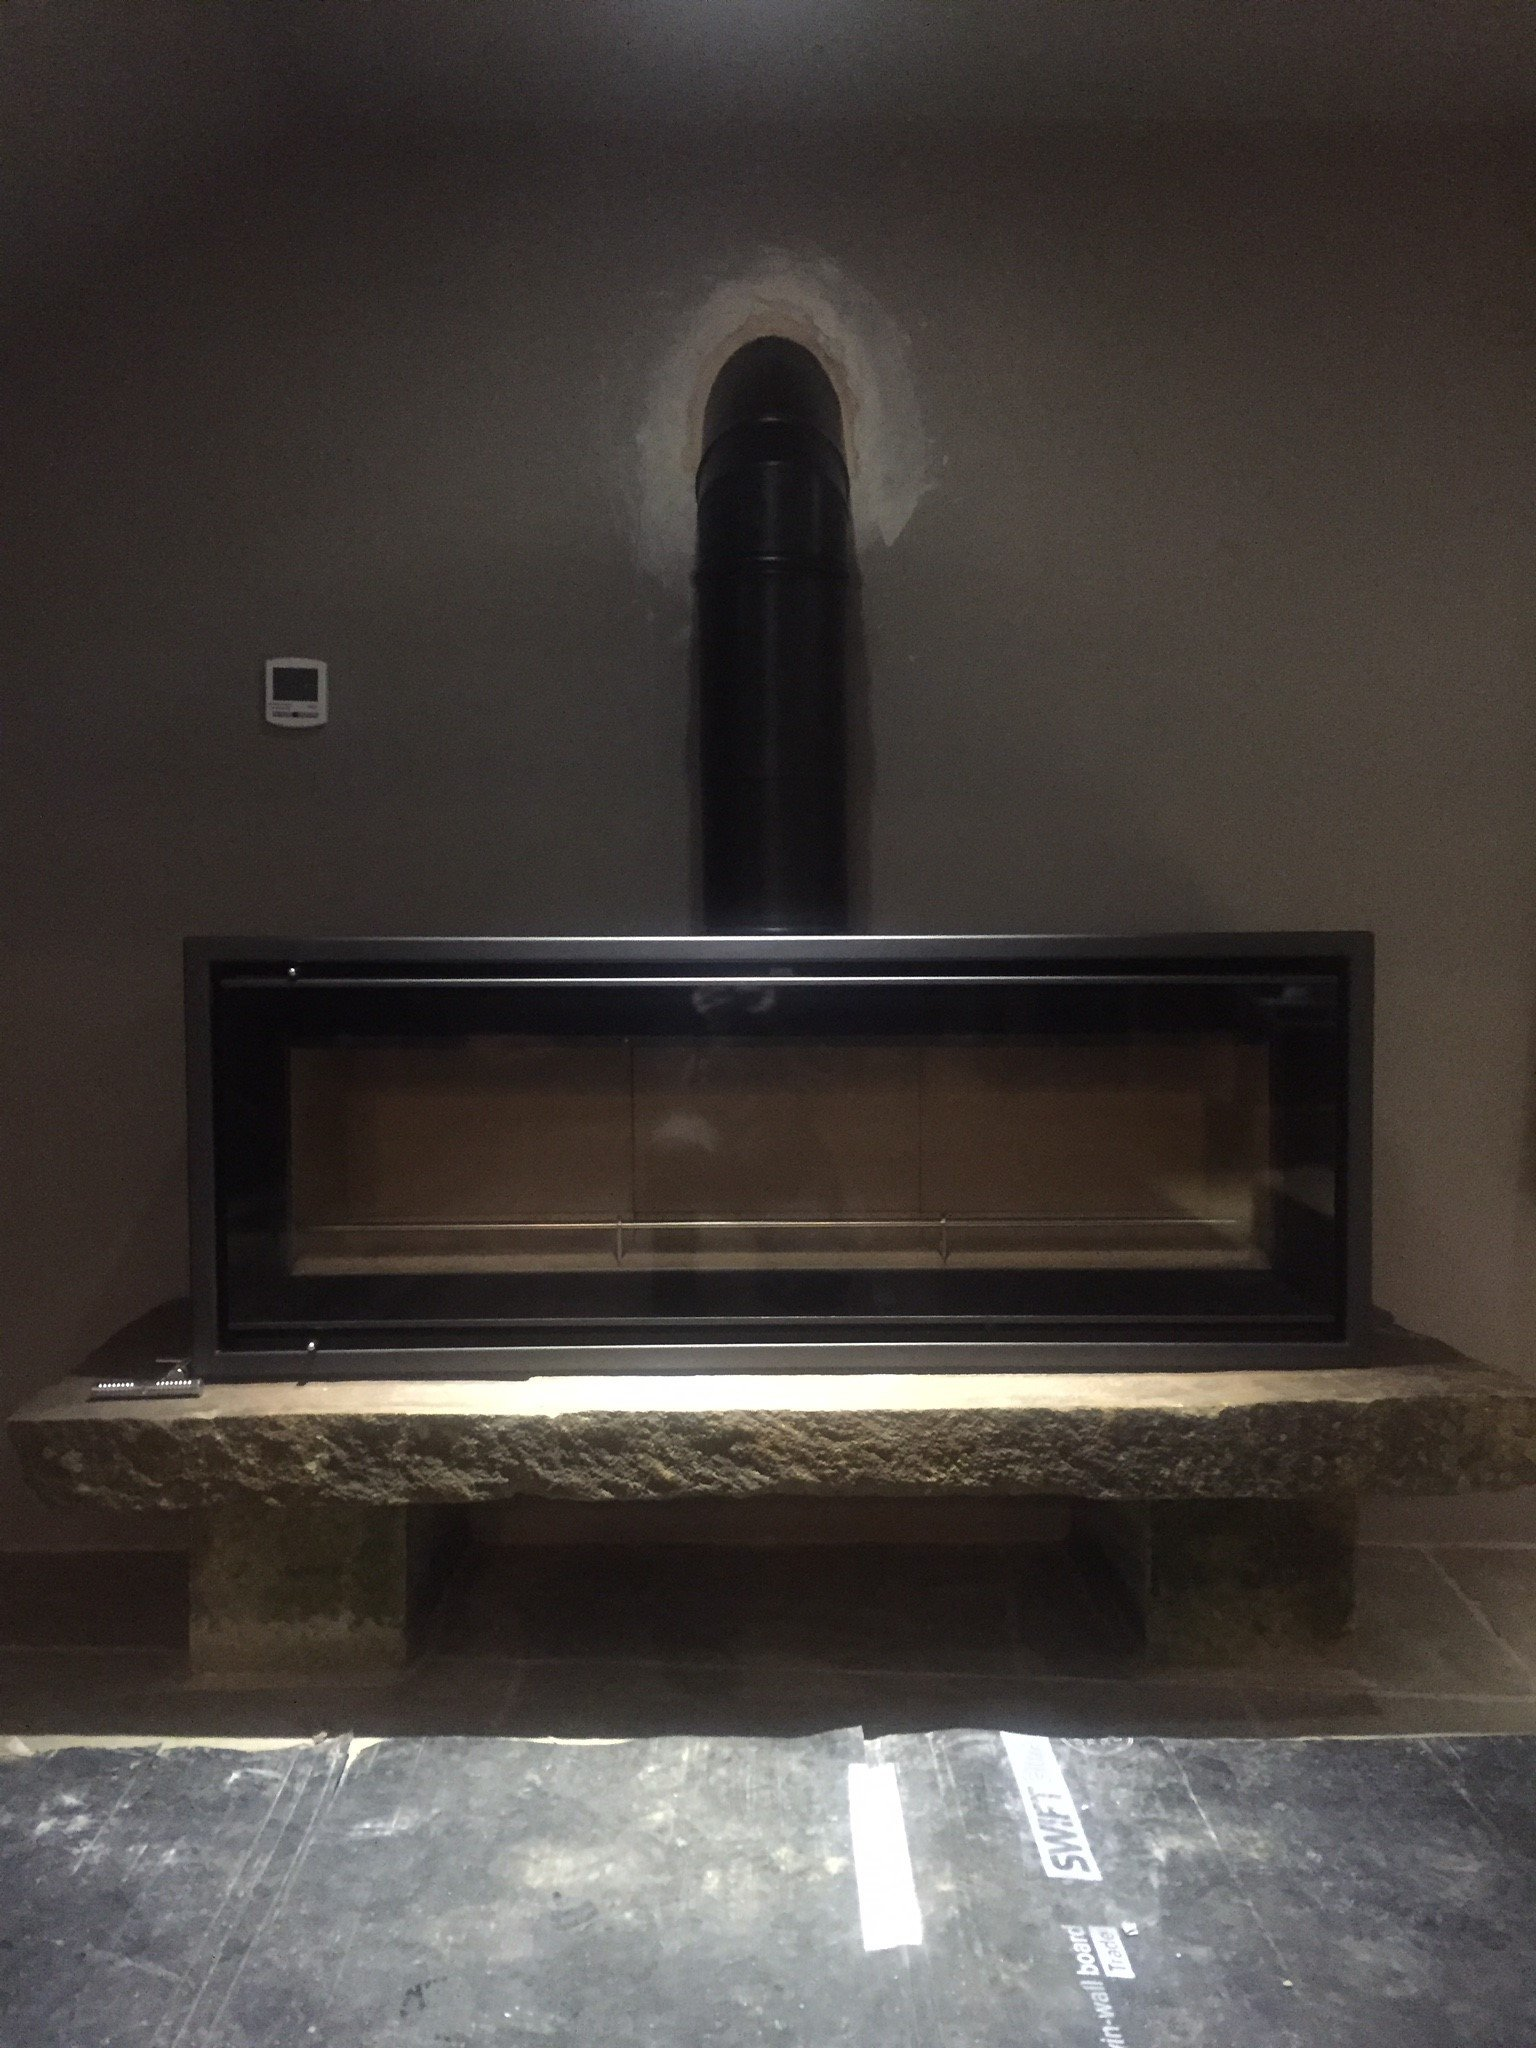 Quality stove